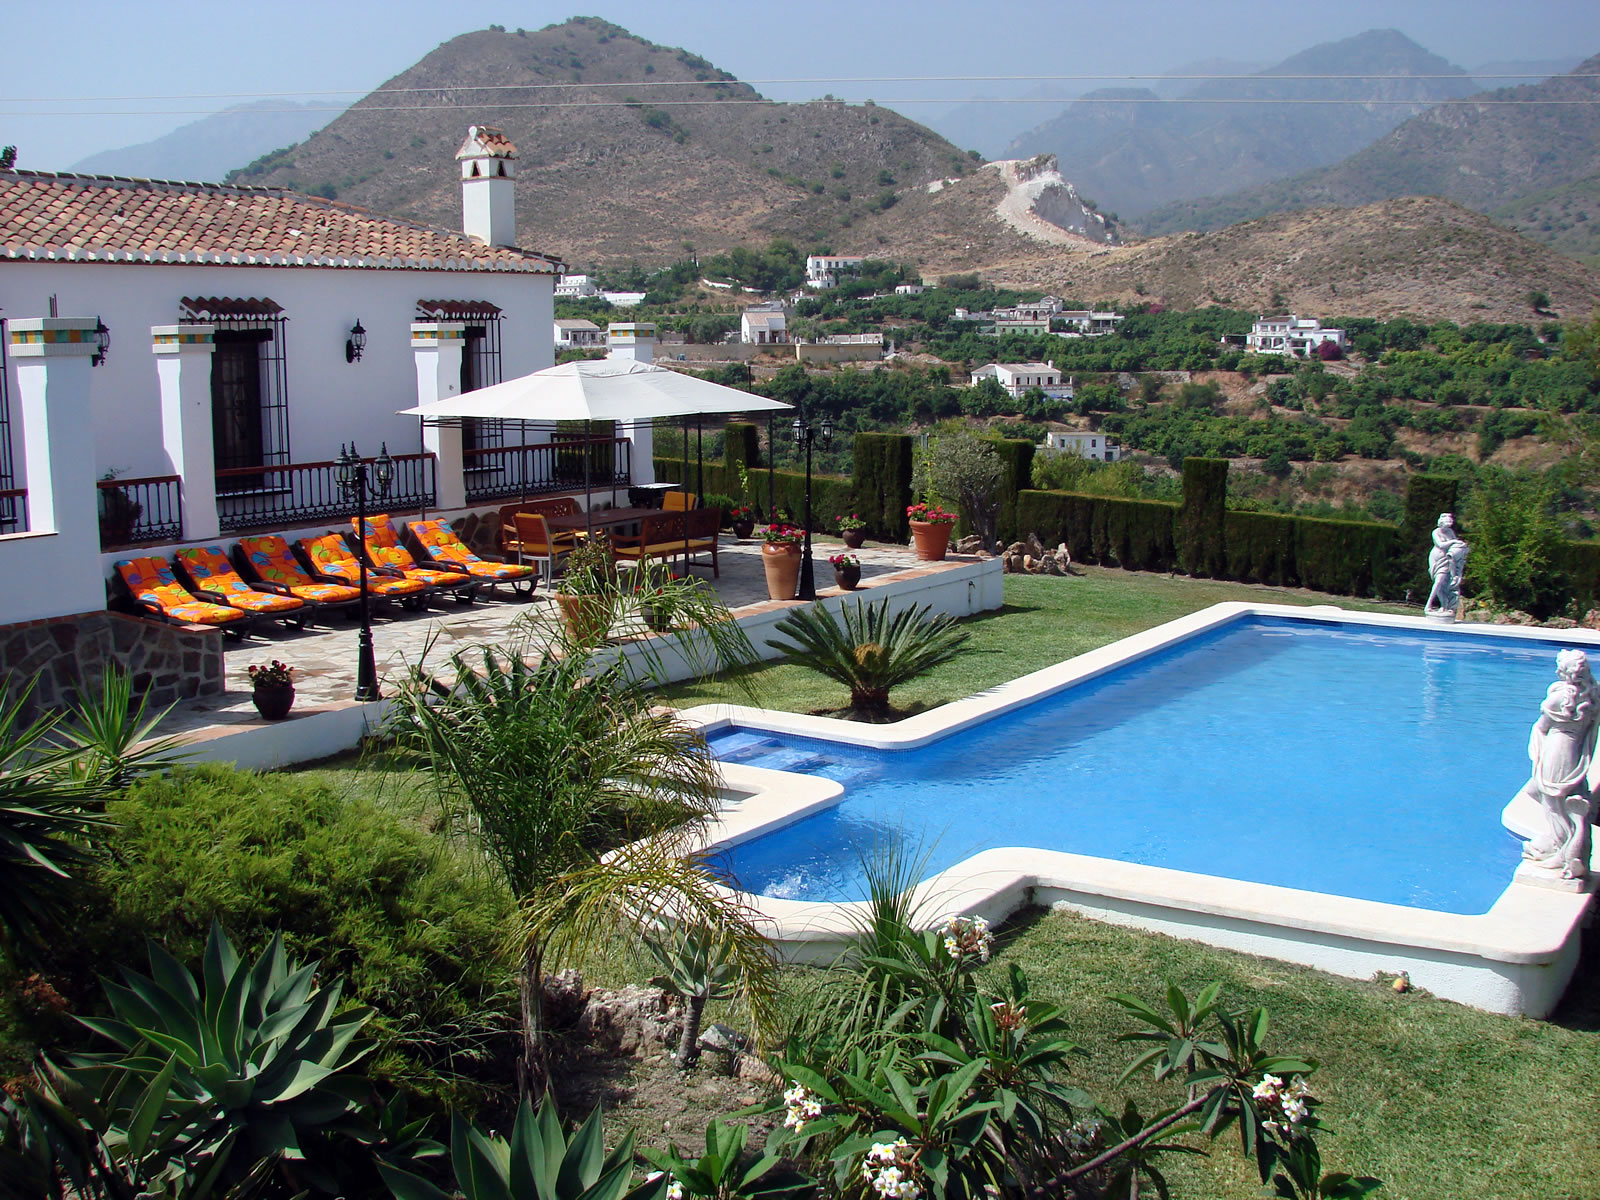 Villa Canta Ranas view